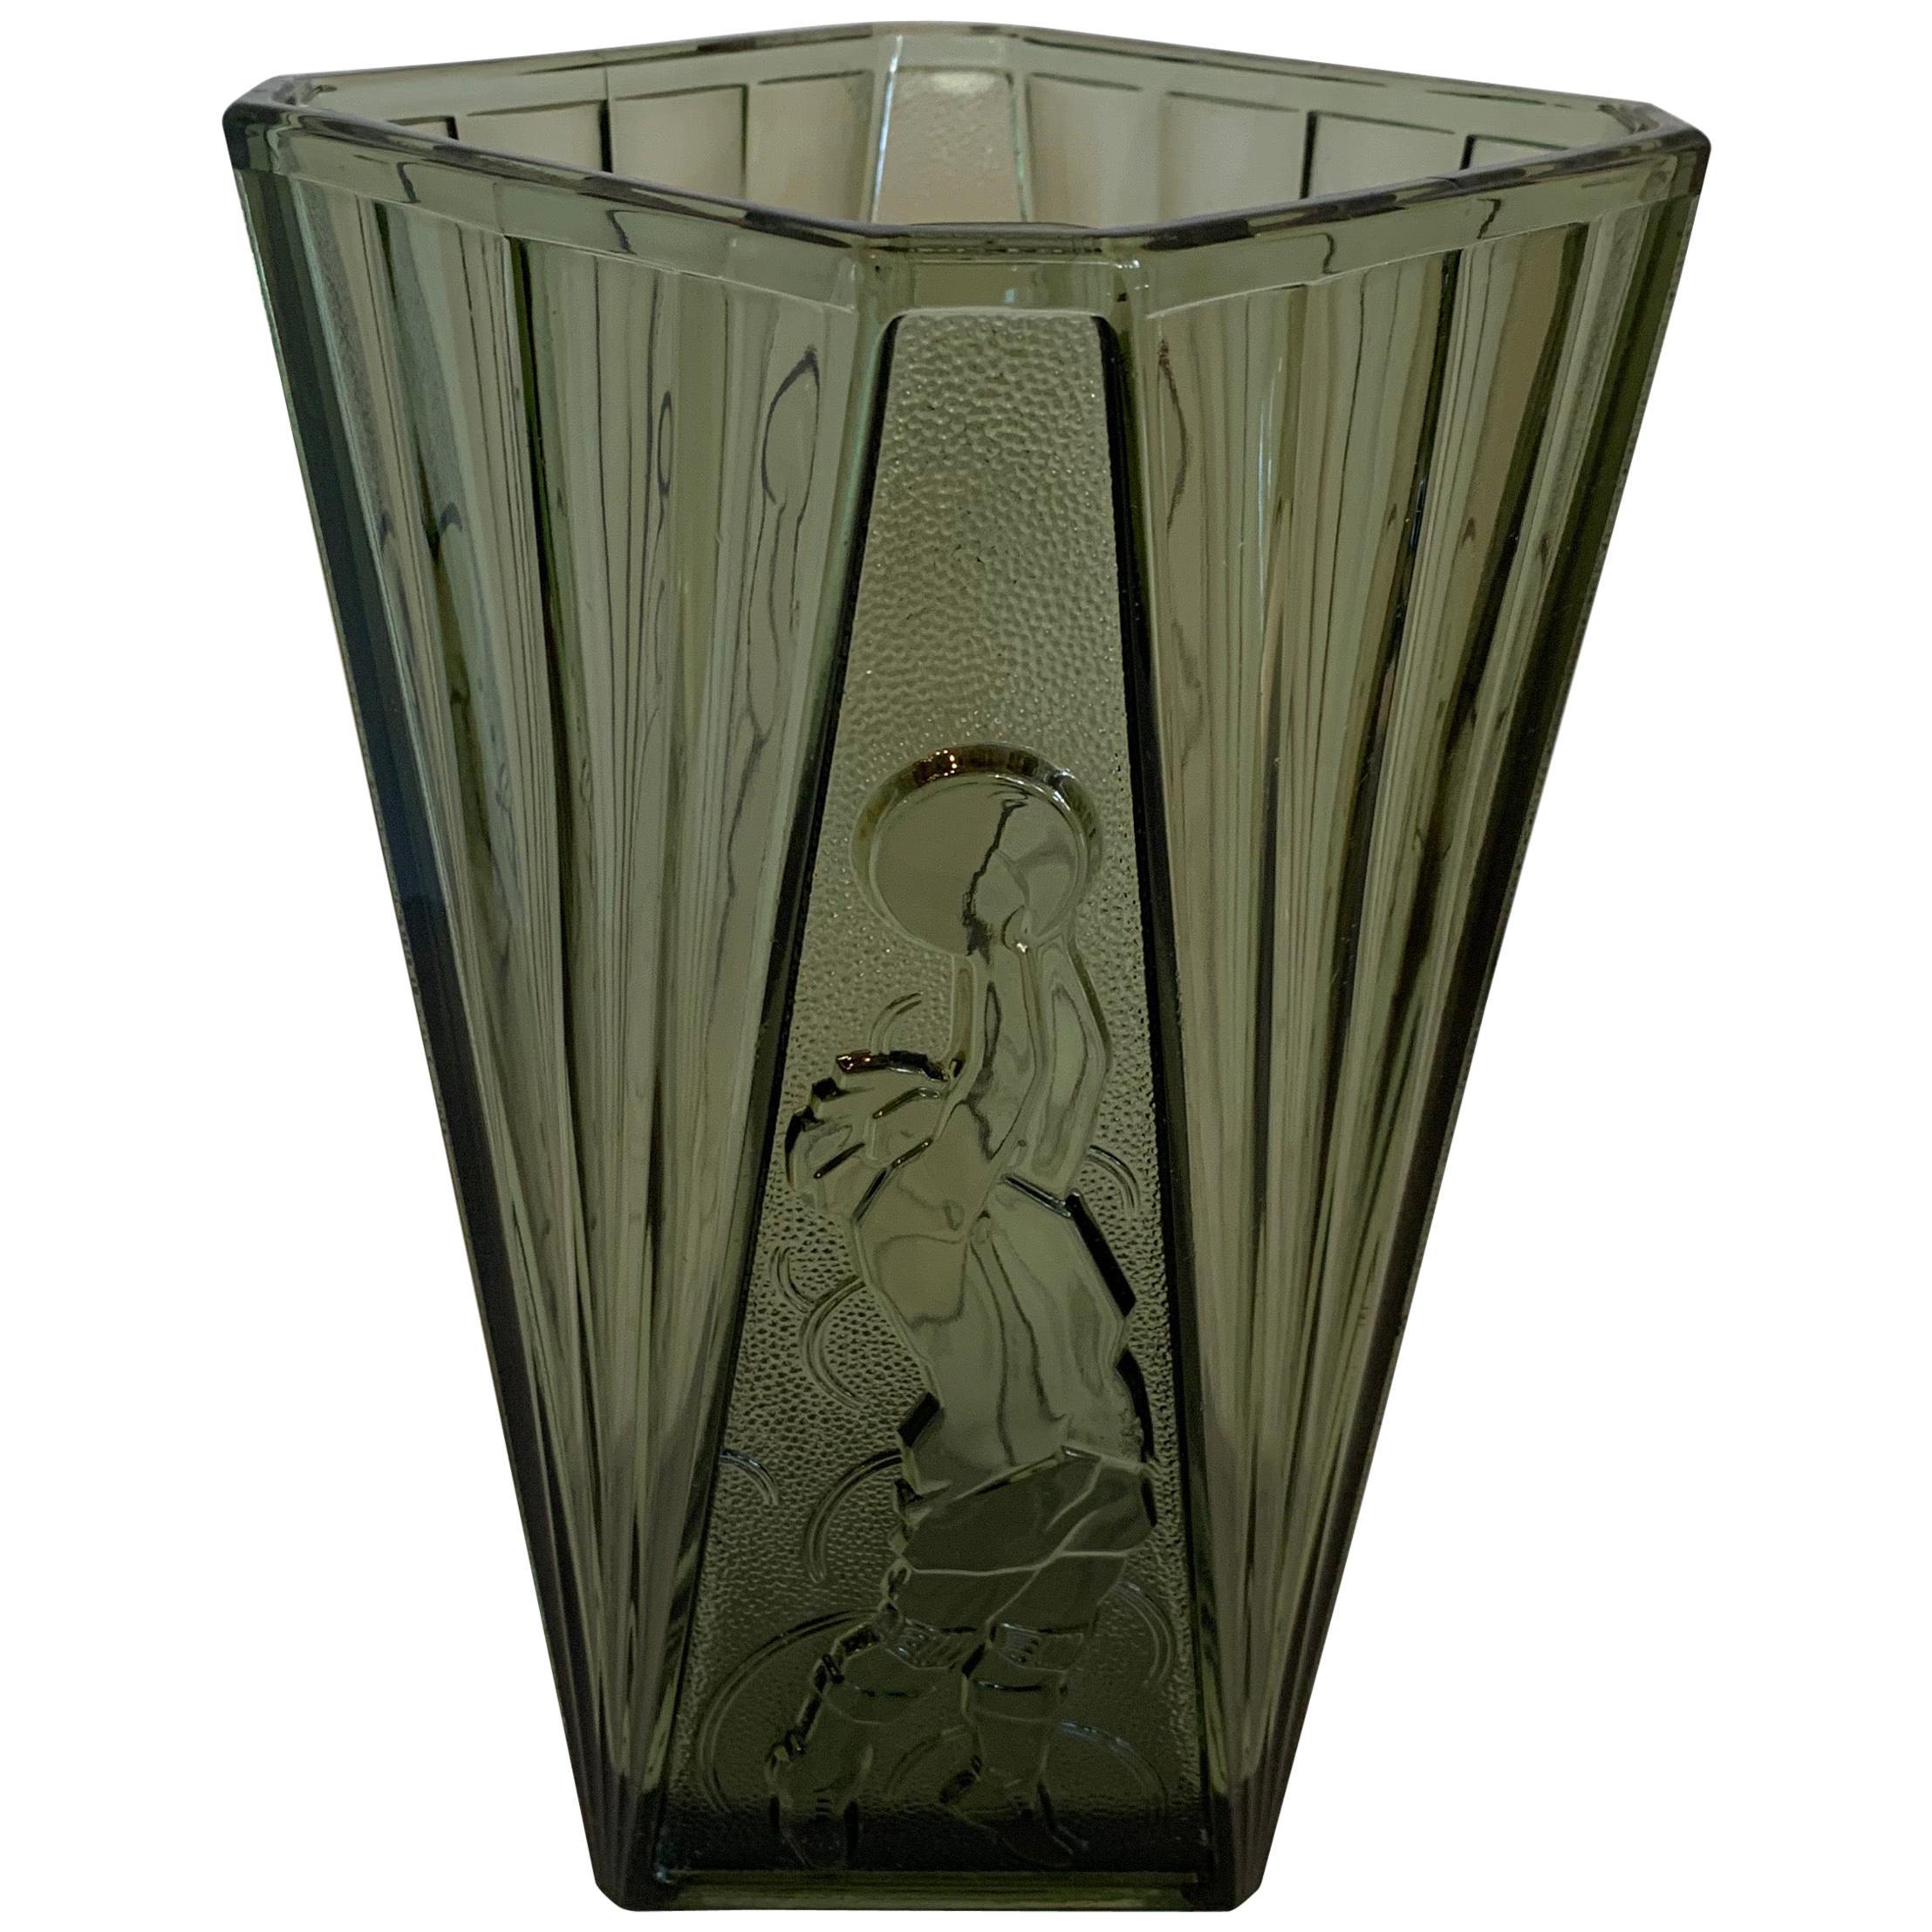 Wonderful Art Deco Val Saint Lambert Luxval Vase Basketball Player Crystal Vase